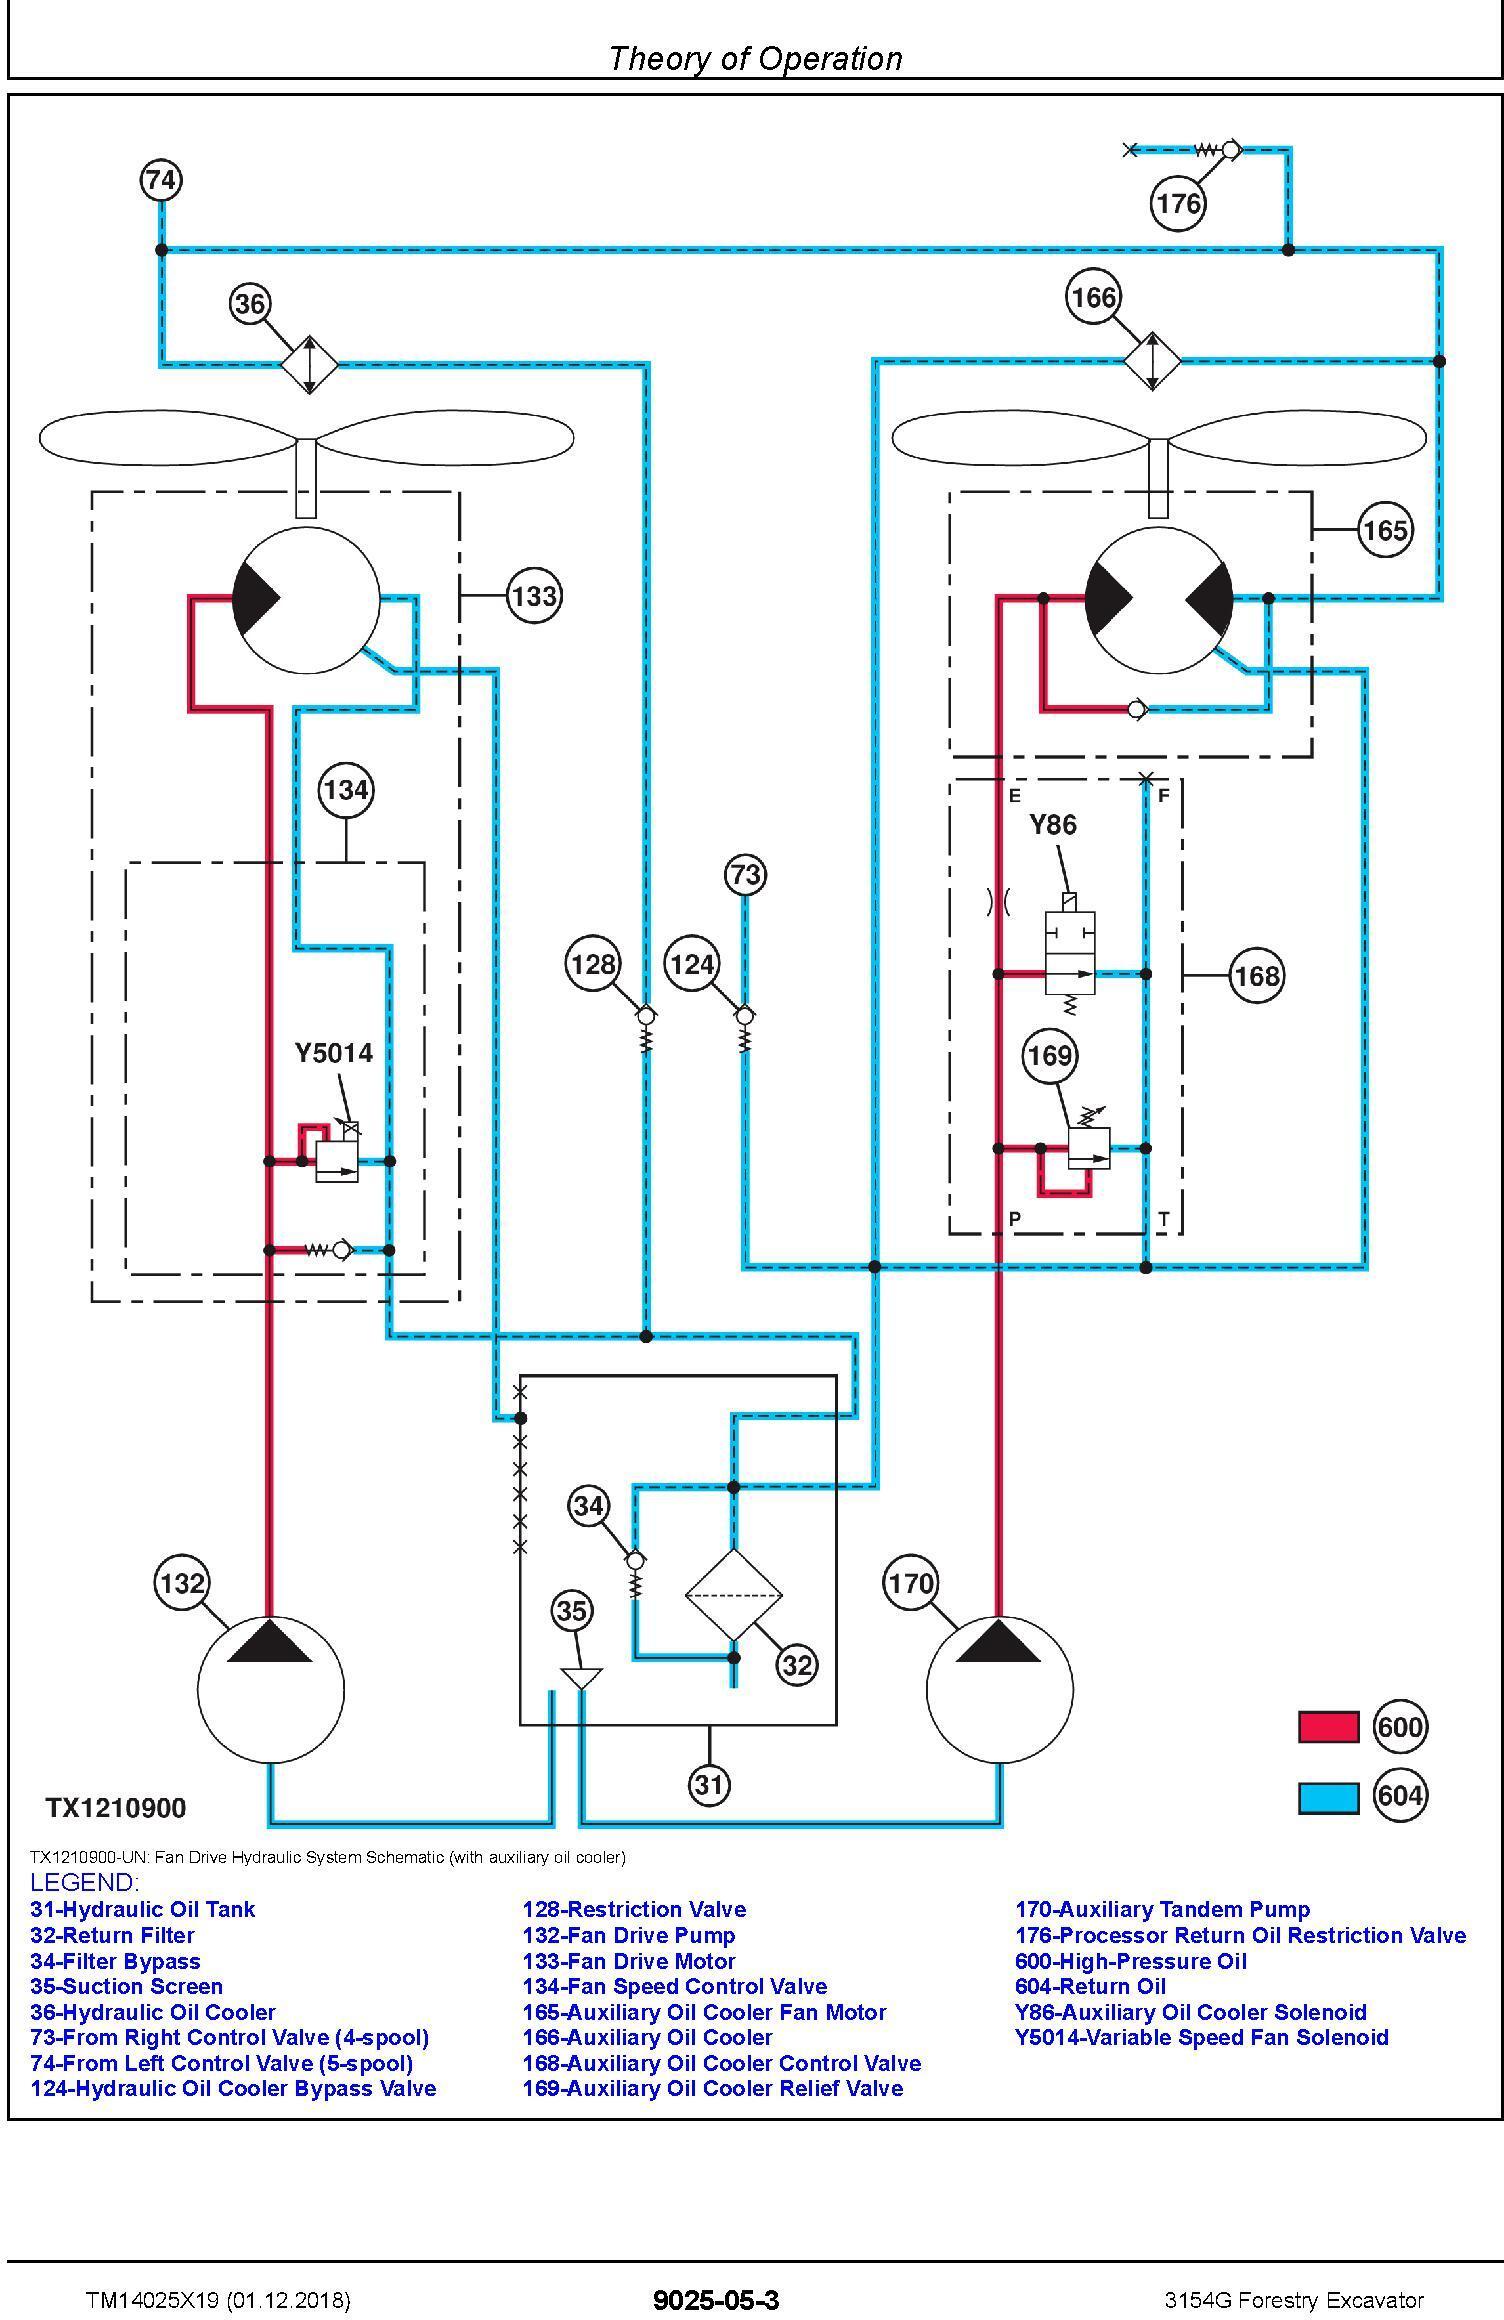 John Deere 3154G (SN. F310001-) Forestry Excavator Operation & Test Technical Manual (TM14025X19) - 2